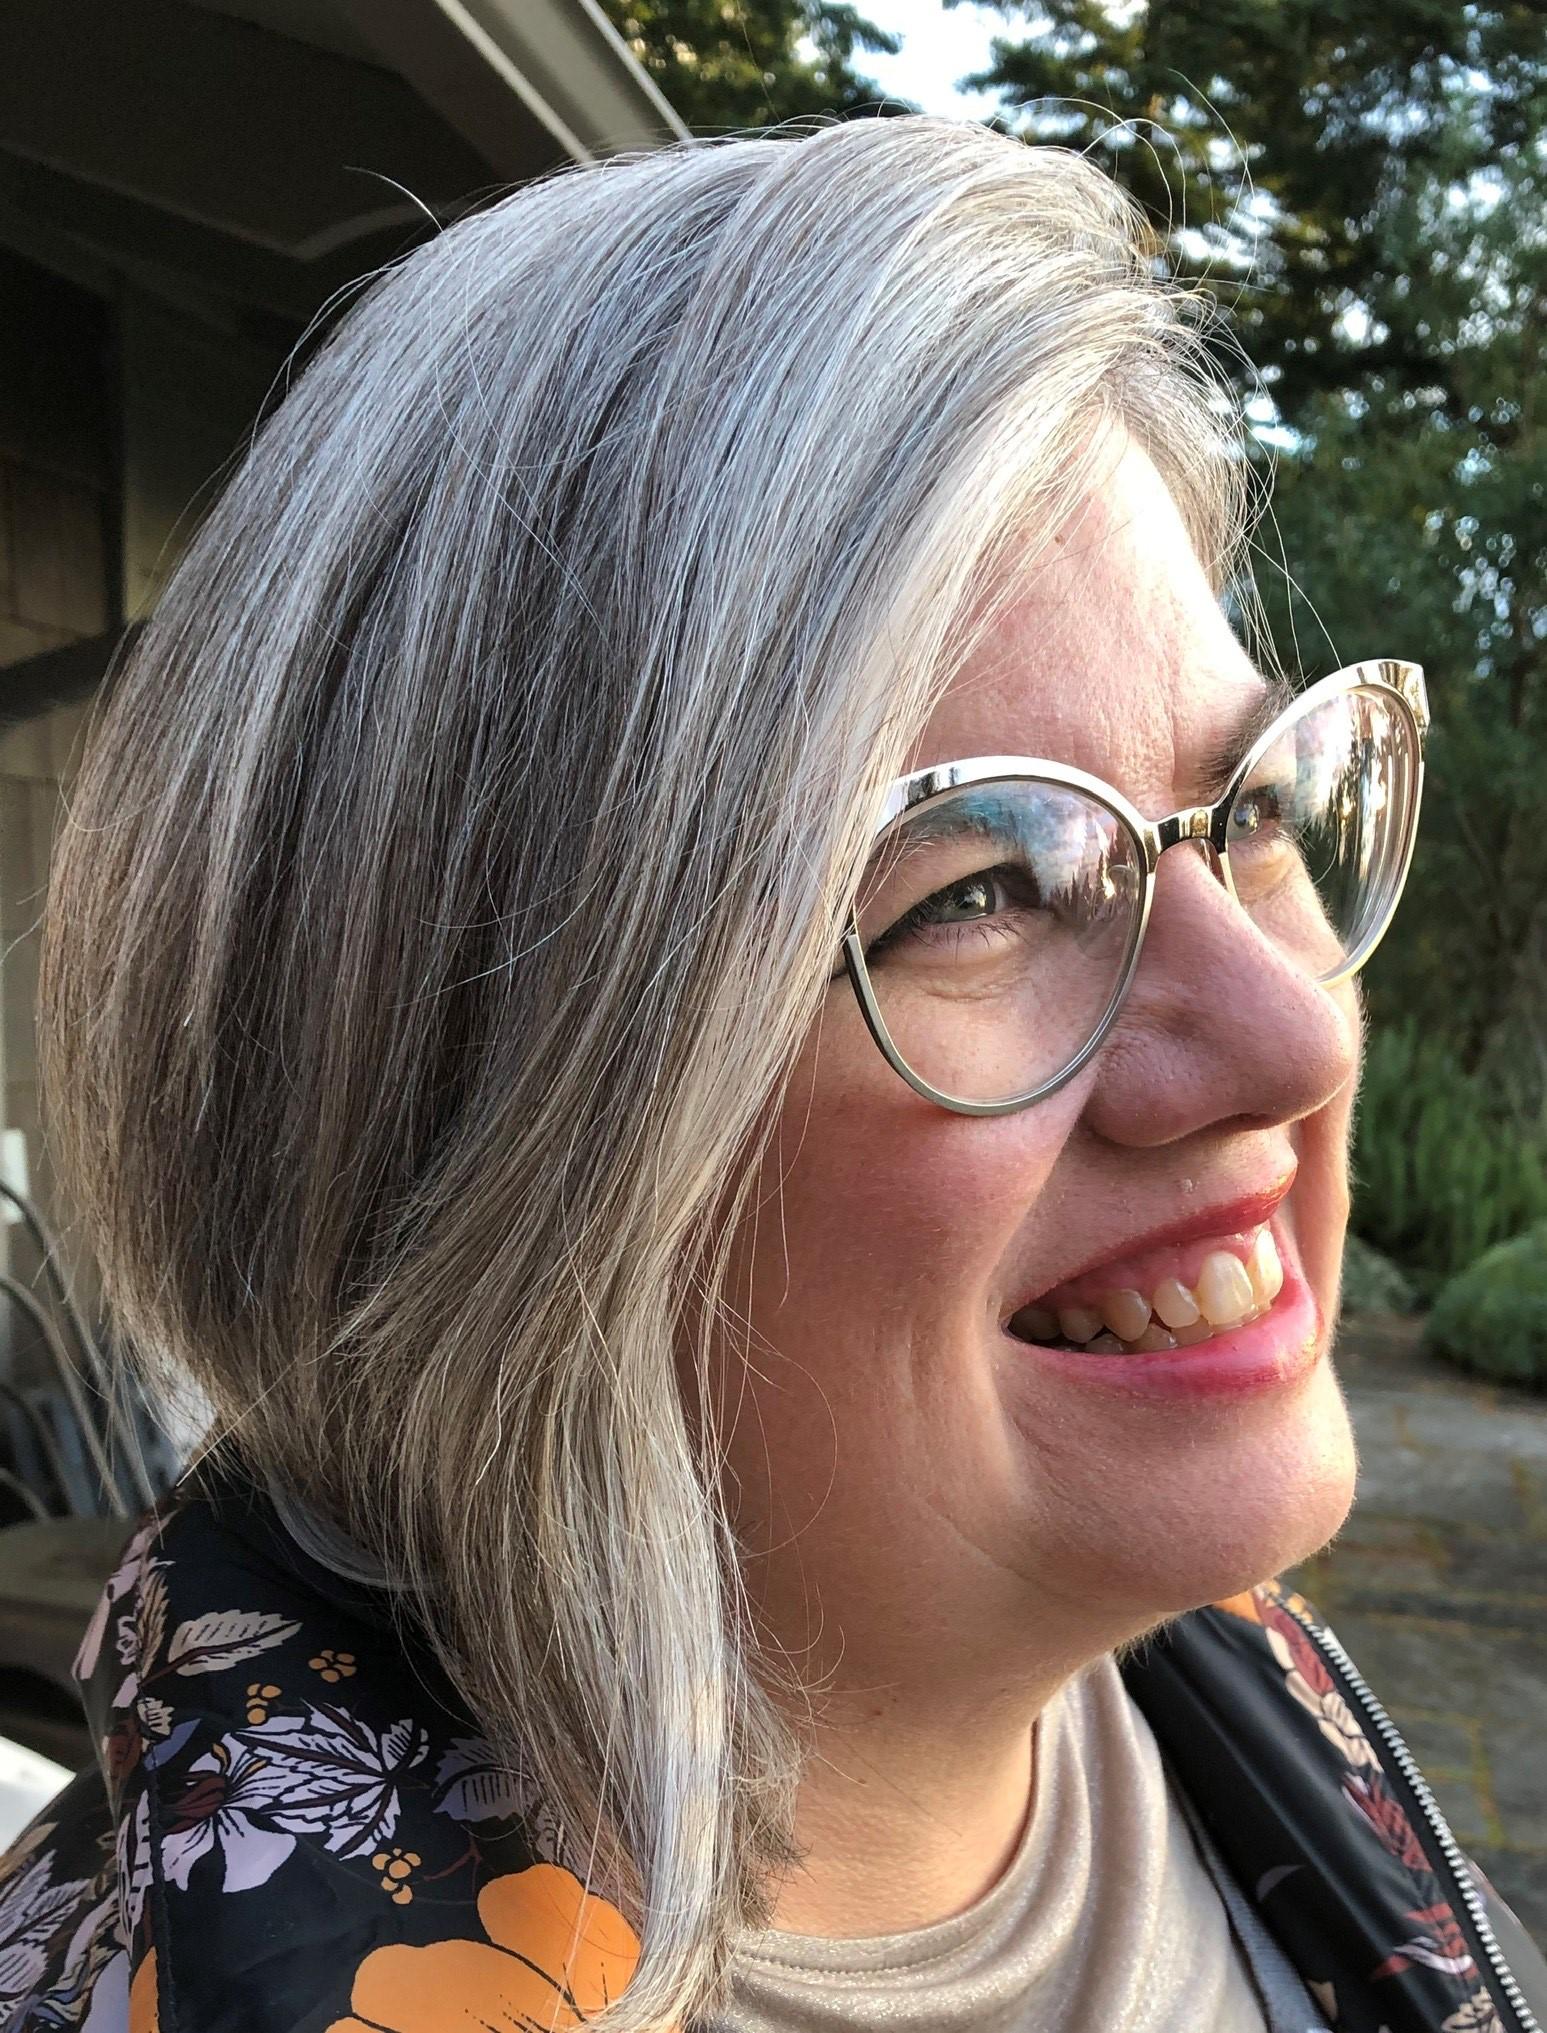 Tara Barber